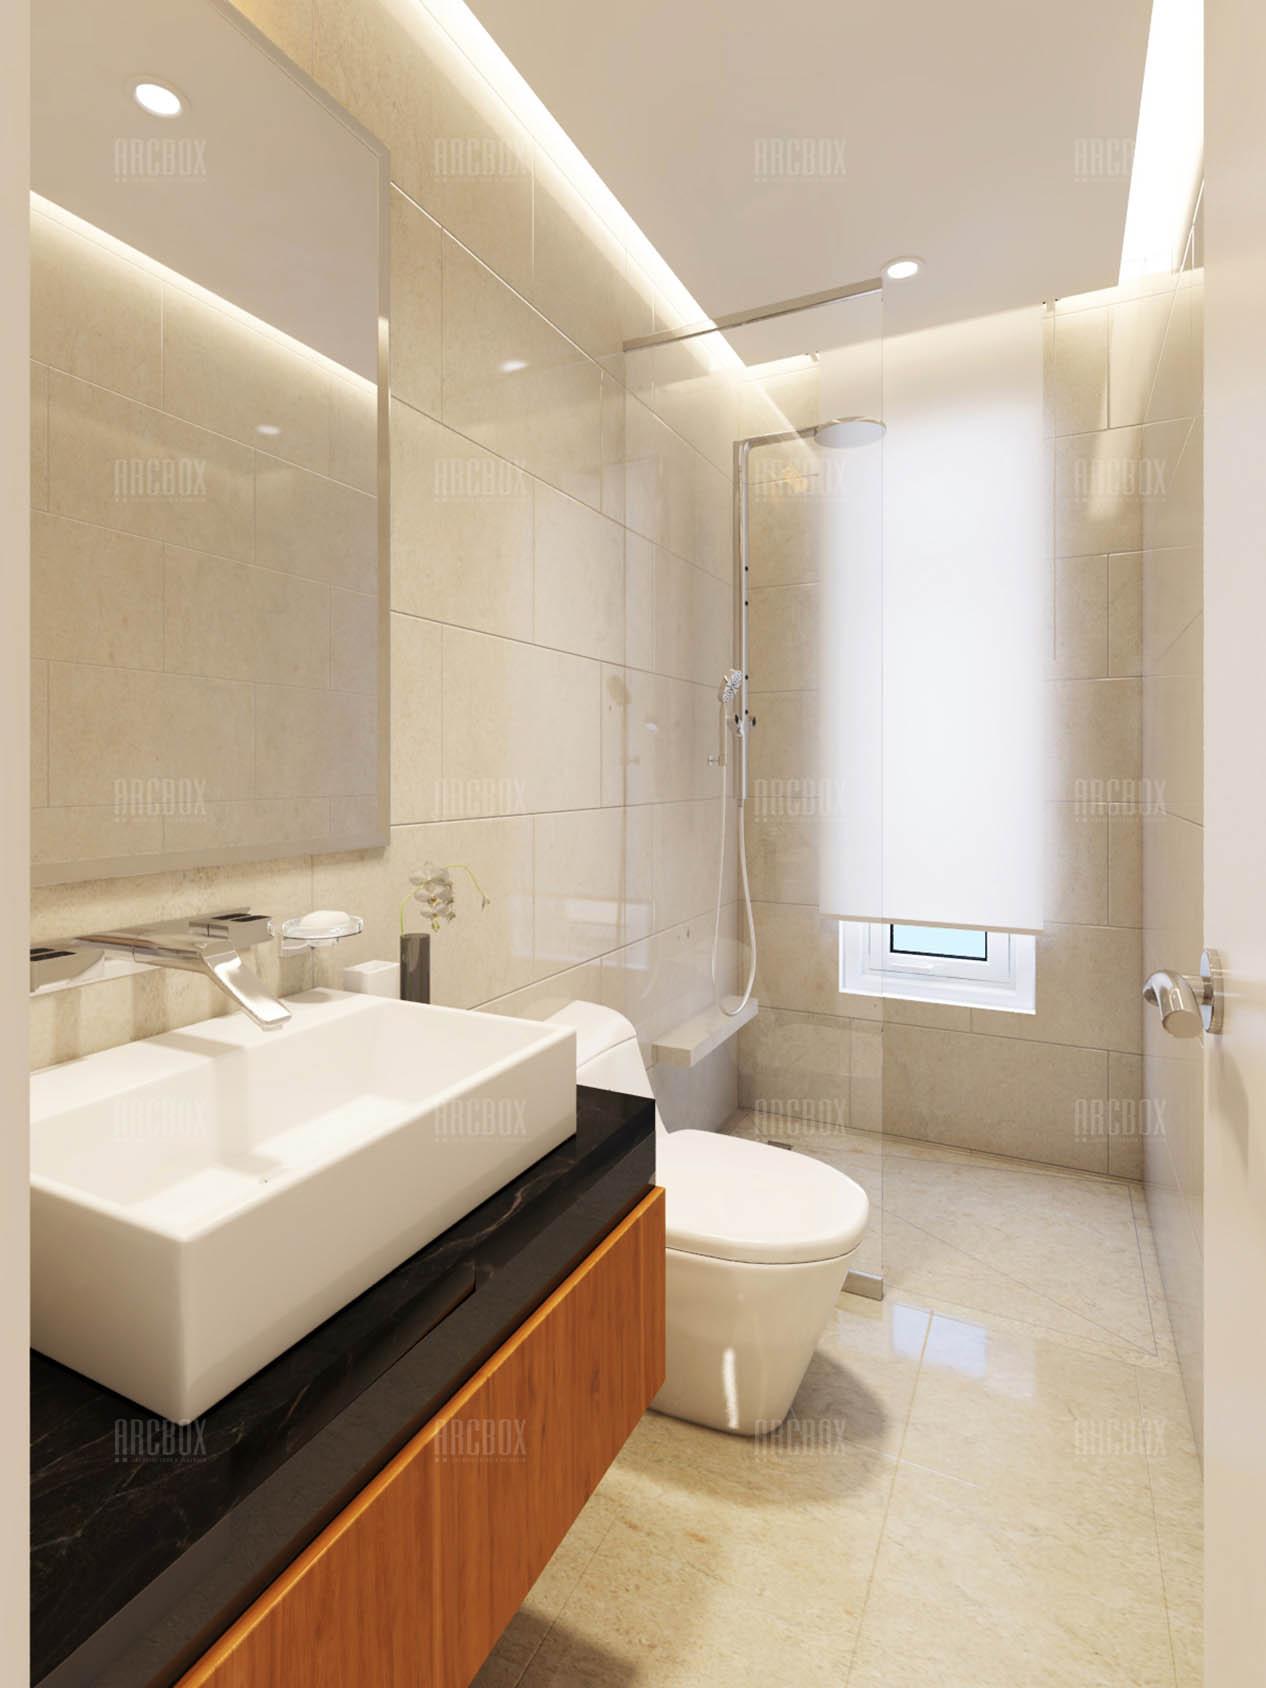 PARKRIVE-F01-BED01-WC